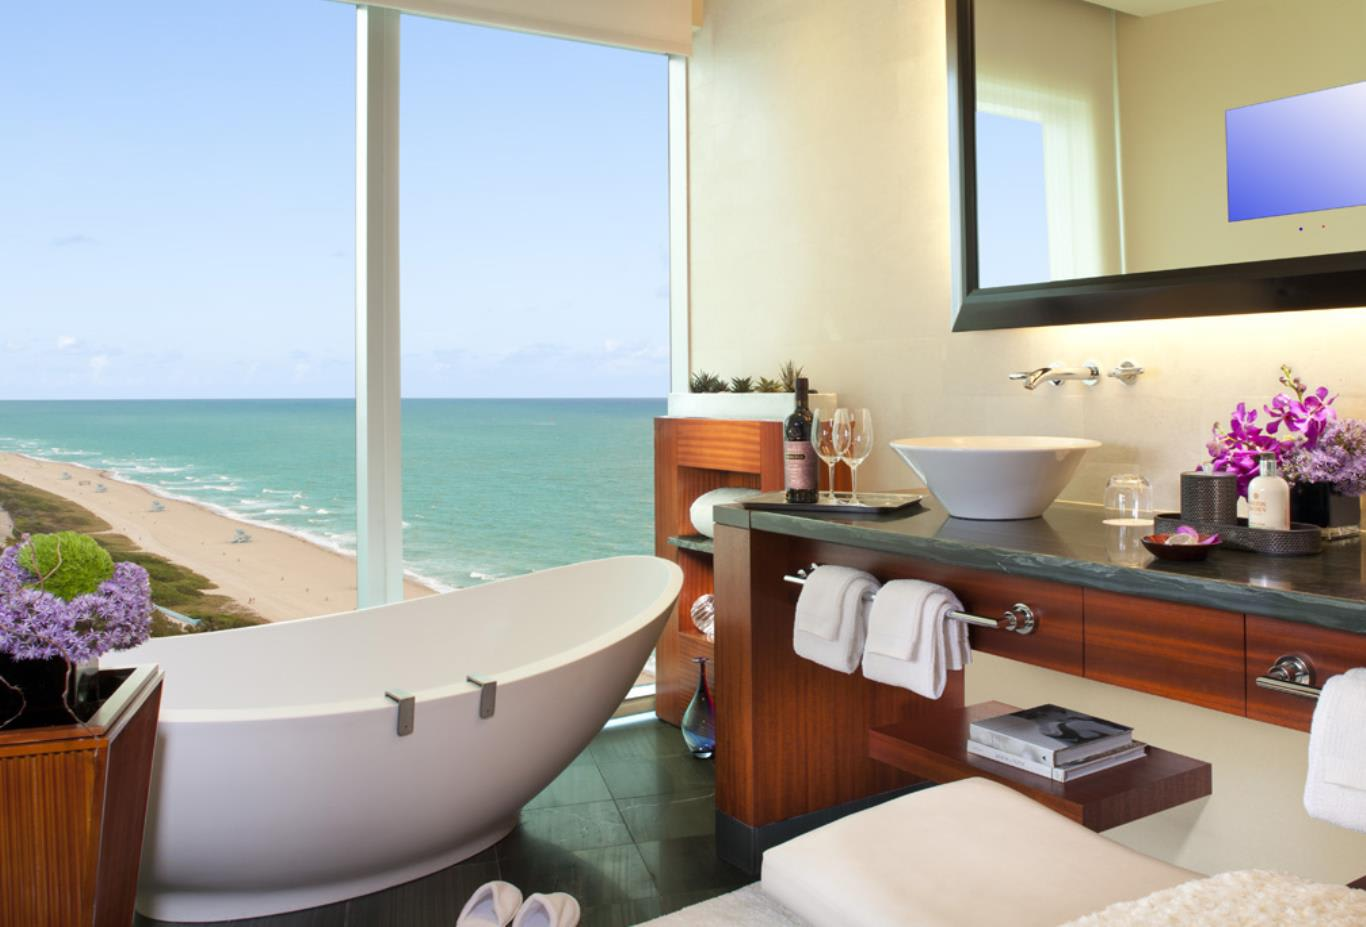 Guestroom-bath-nws